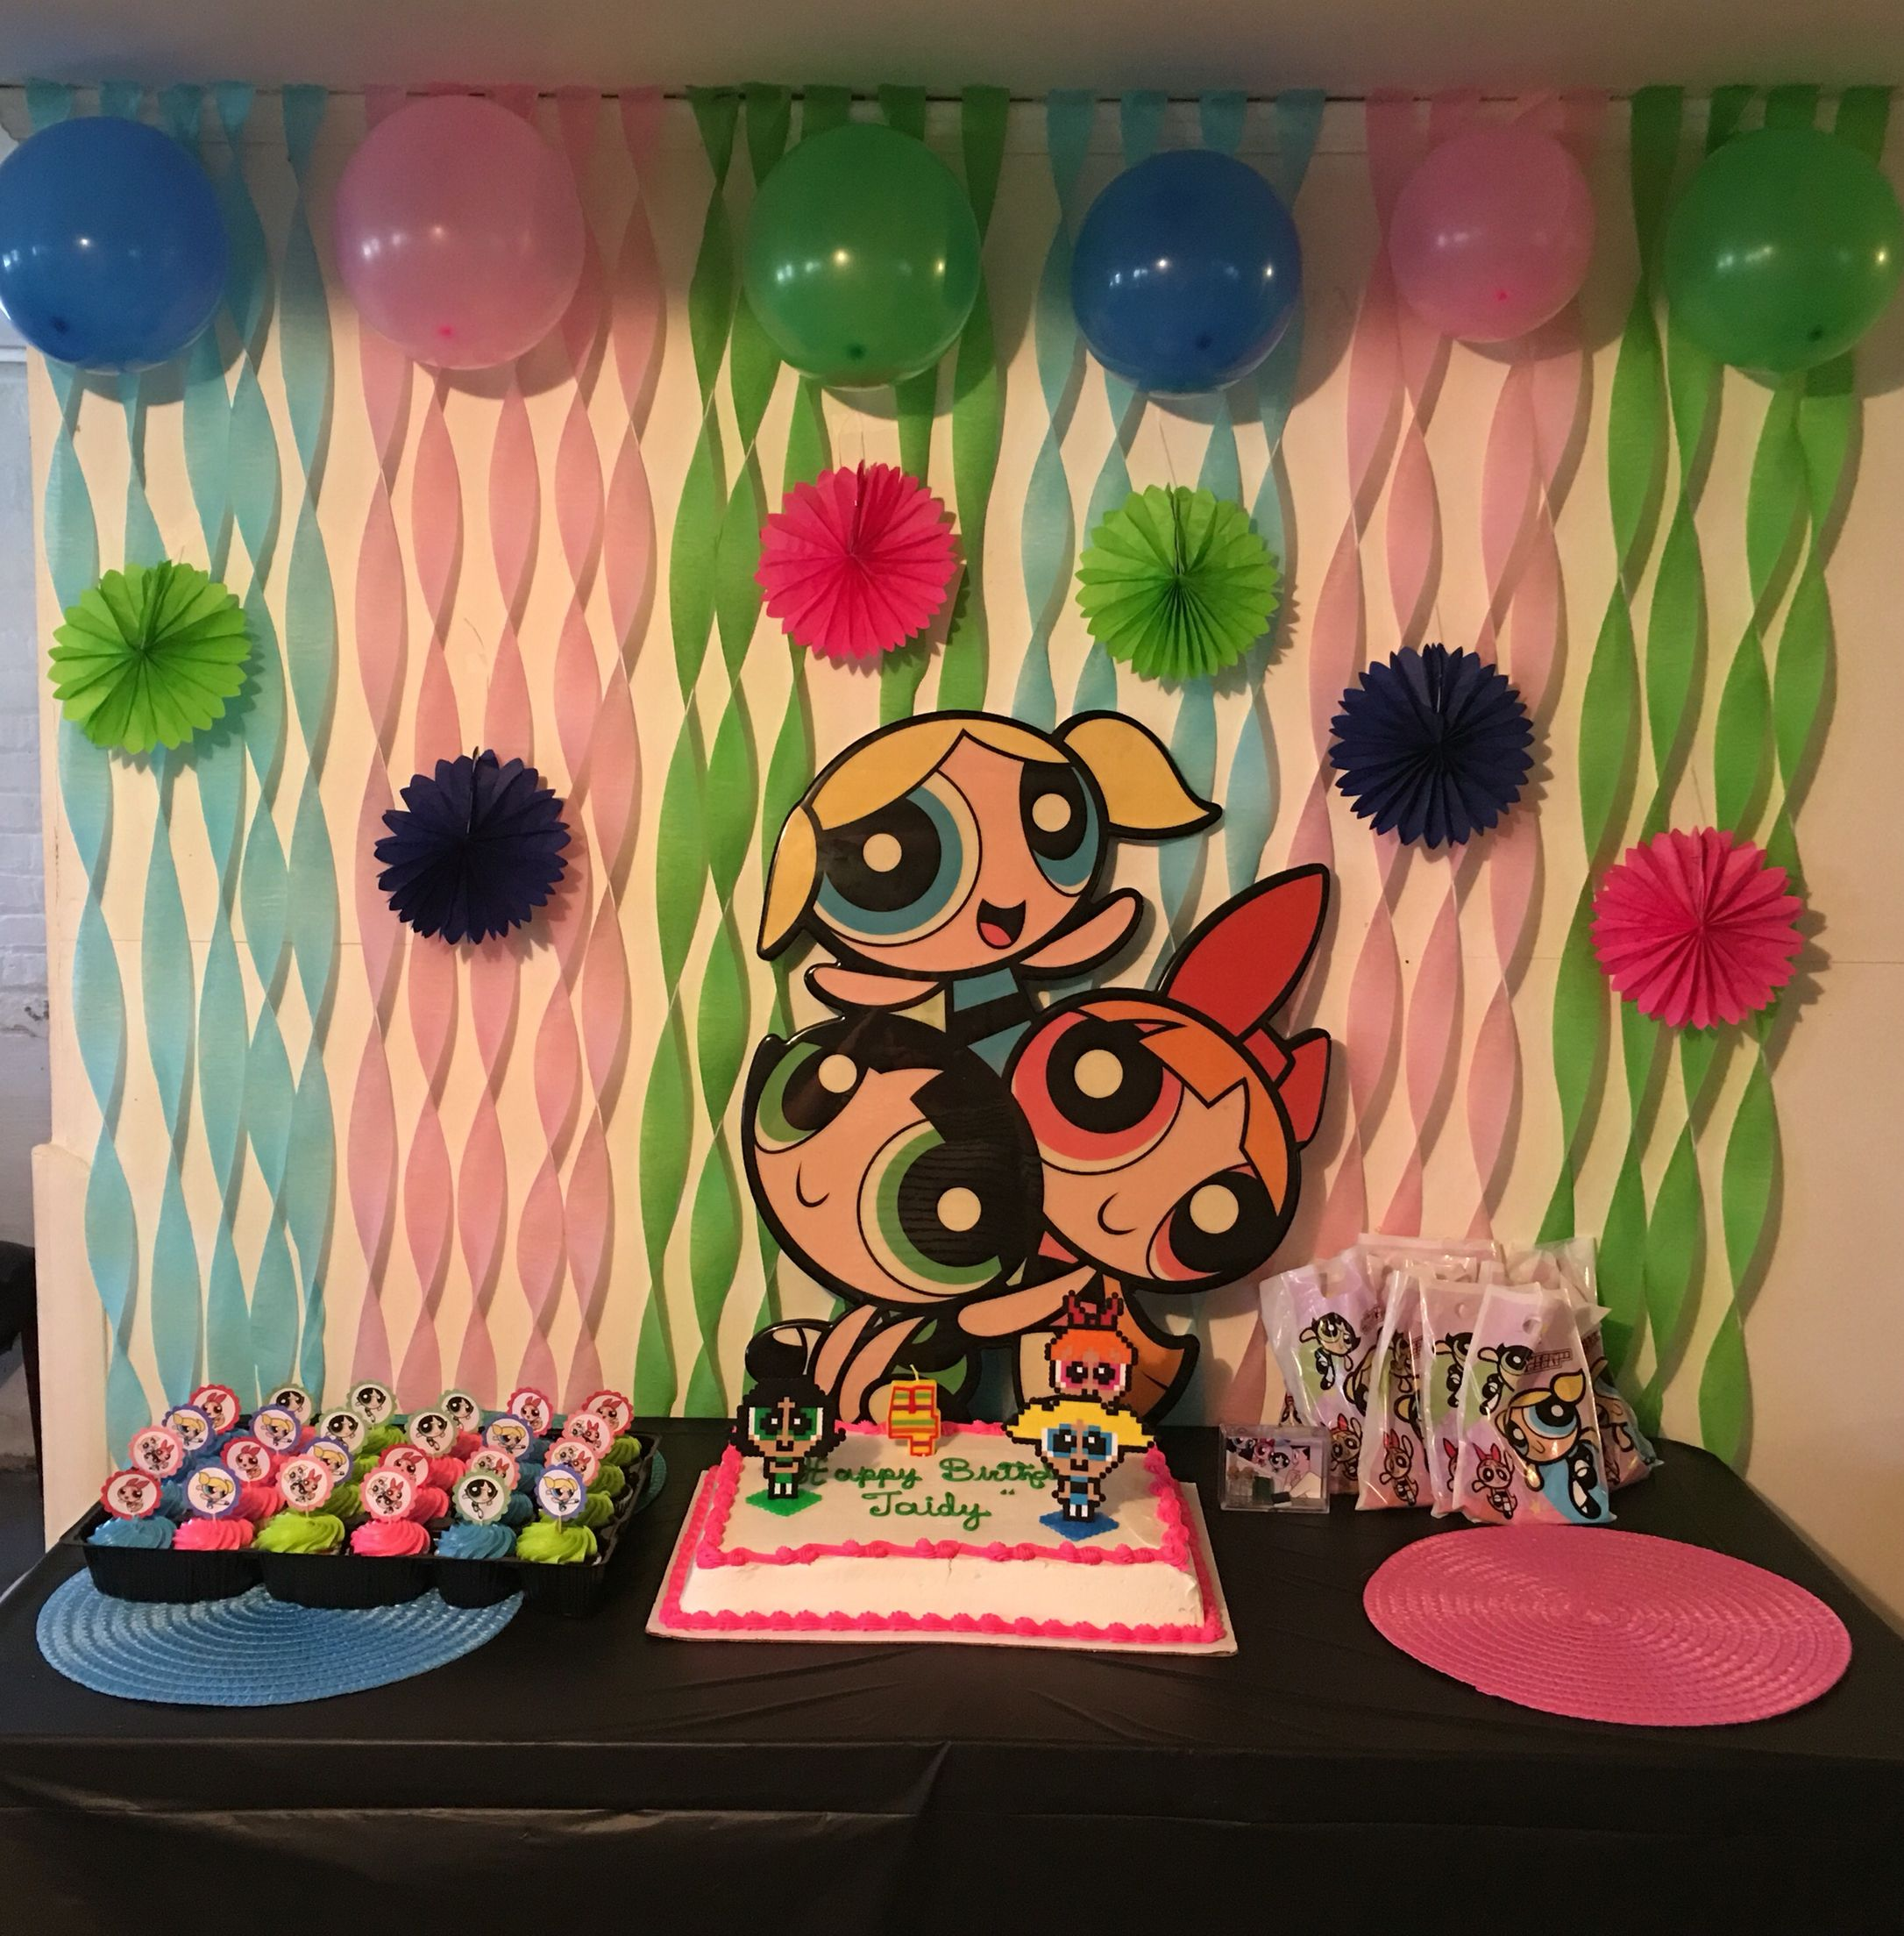 Powerpuff girls birthday party! Girl birthday themes